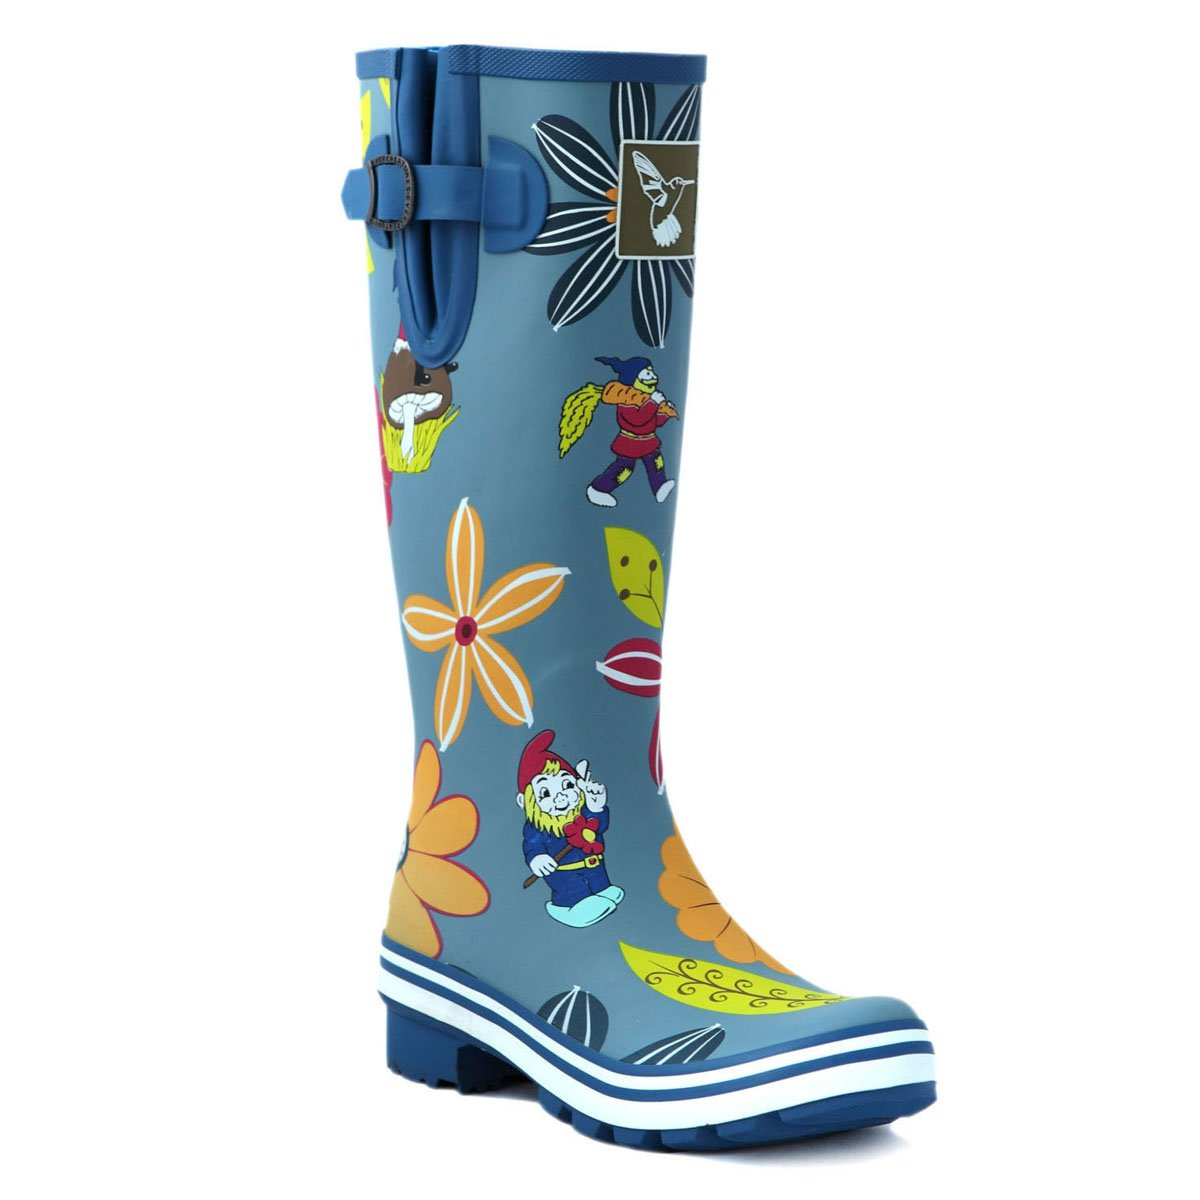 Evercreatures Women's Rain Boots UK Brand Original Tall B00AUDZ1NI Rain Boot Gumboots Wellies B00AUDZ1NI Tall 7 B(M) US / UK5 / EU38|Blue 7f41f7